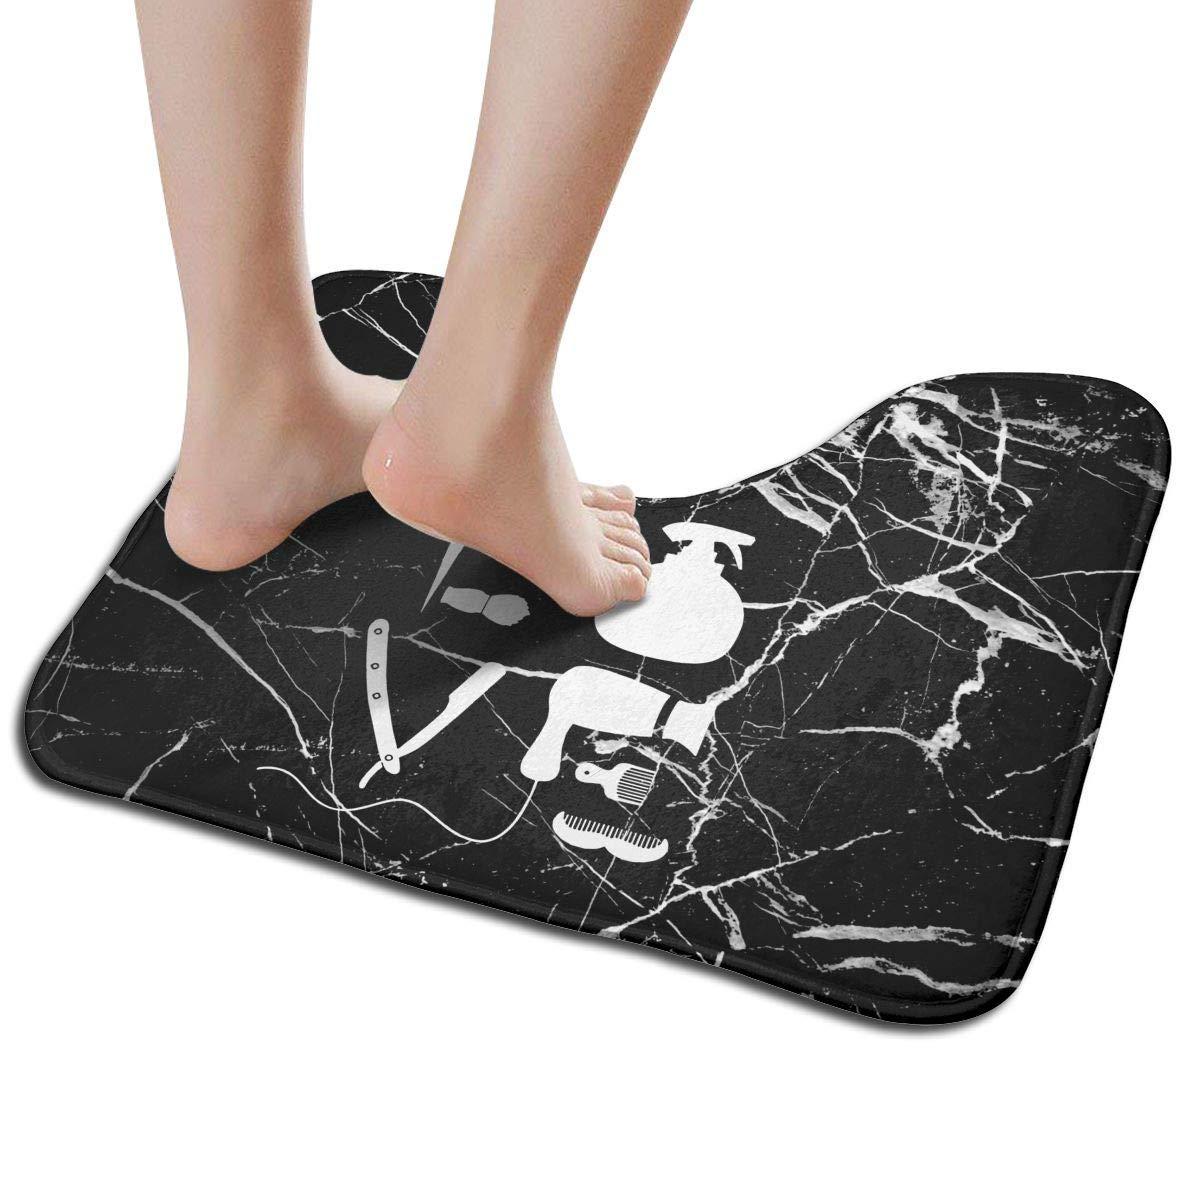 Hoklcvd Friseursalon Friseur Liebe U-f/örmige Toilette Boden Teppich Rutschfeste Toilette Teppiche Badezimmer Teppich